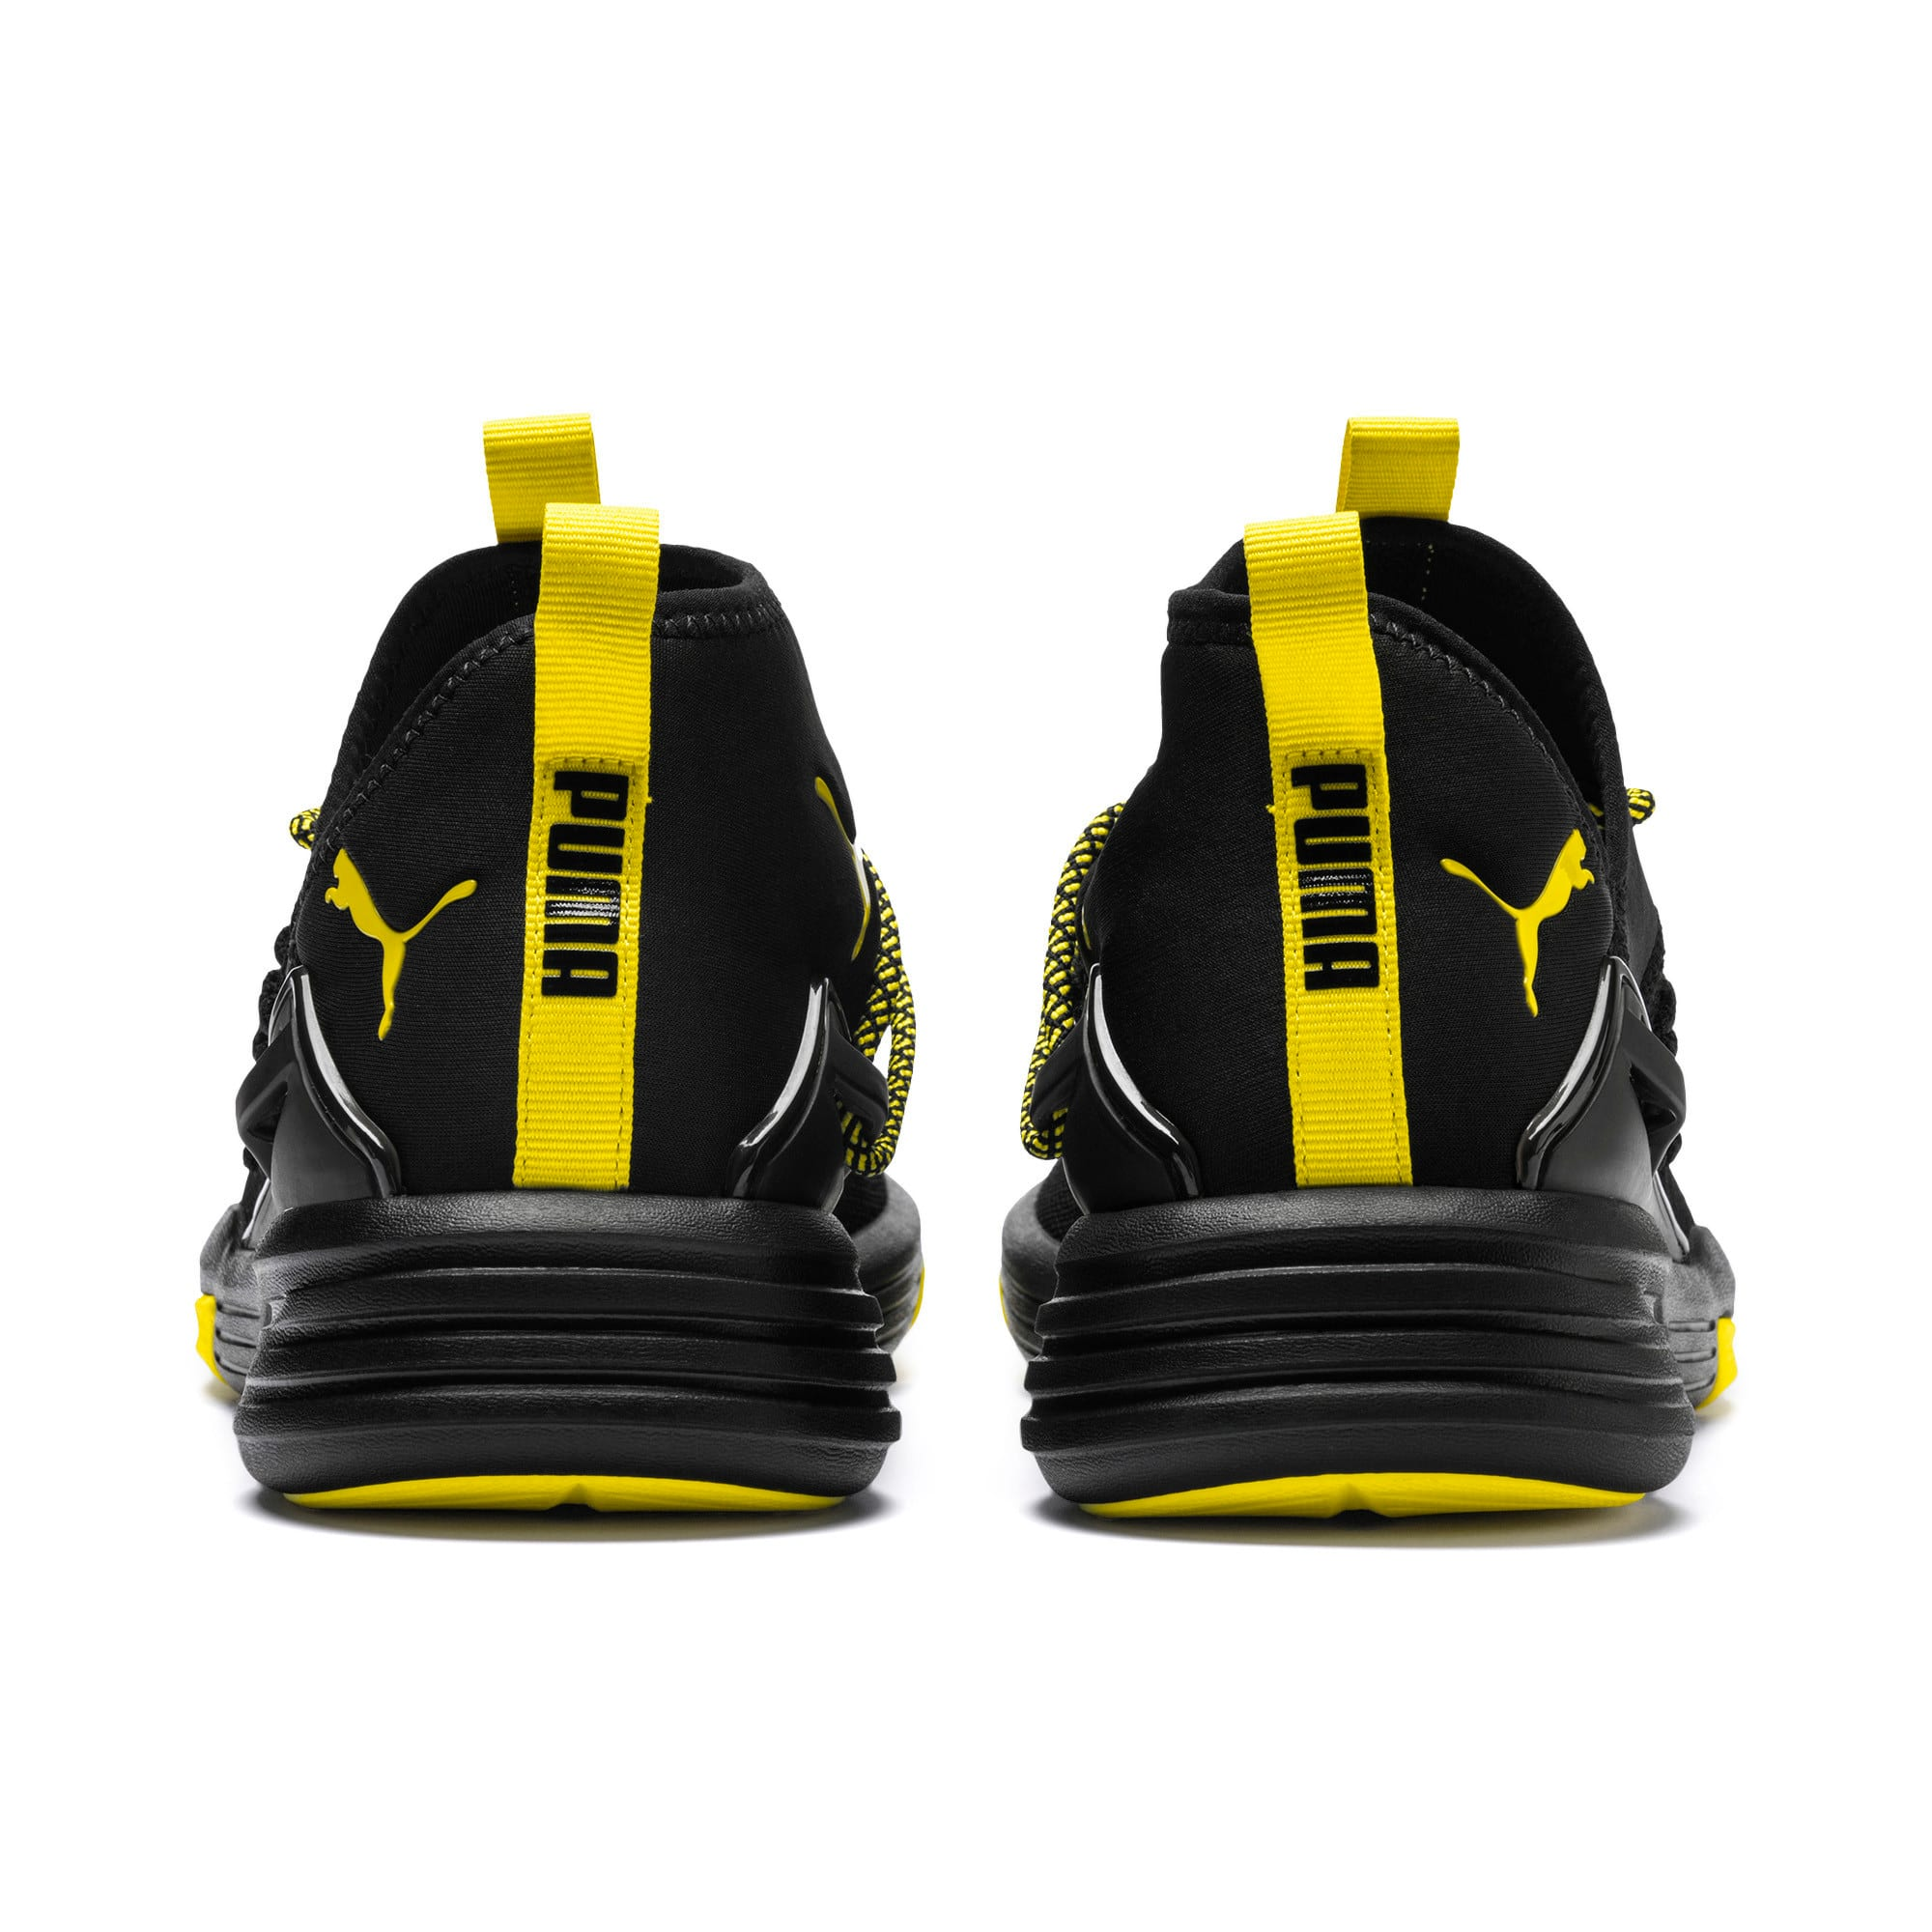 Thumbnail 3 of Mantra Caution Herren Trainingsschuhe, Puma Black-Blazing Yellow, medium